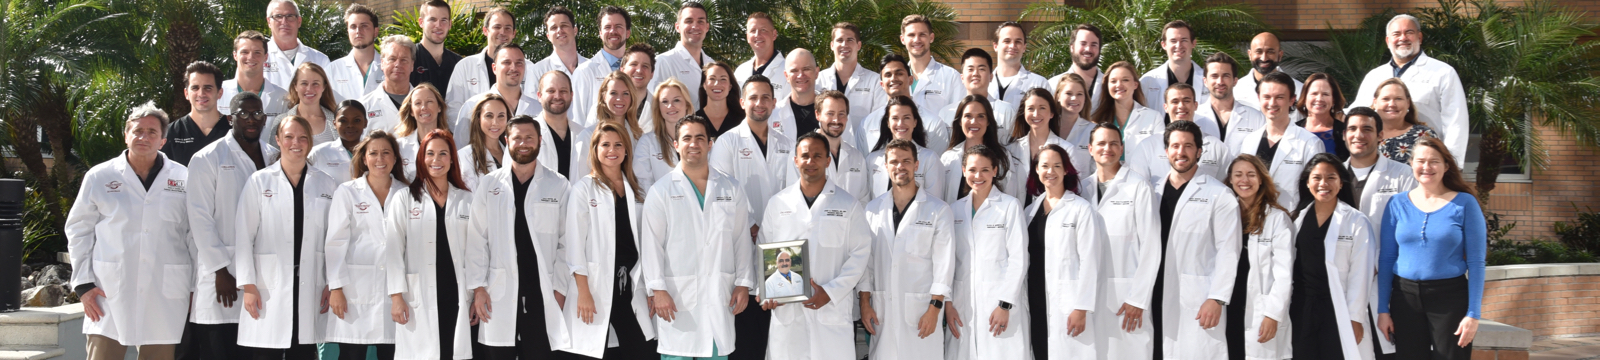 Emergency Medicine Residency - Orlando Health - One of Central